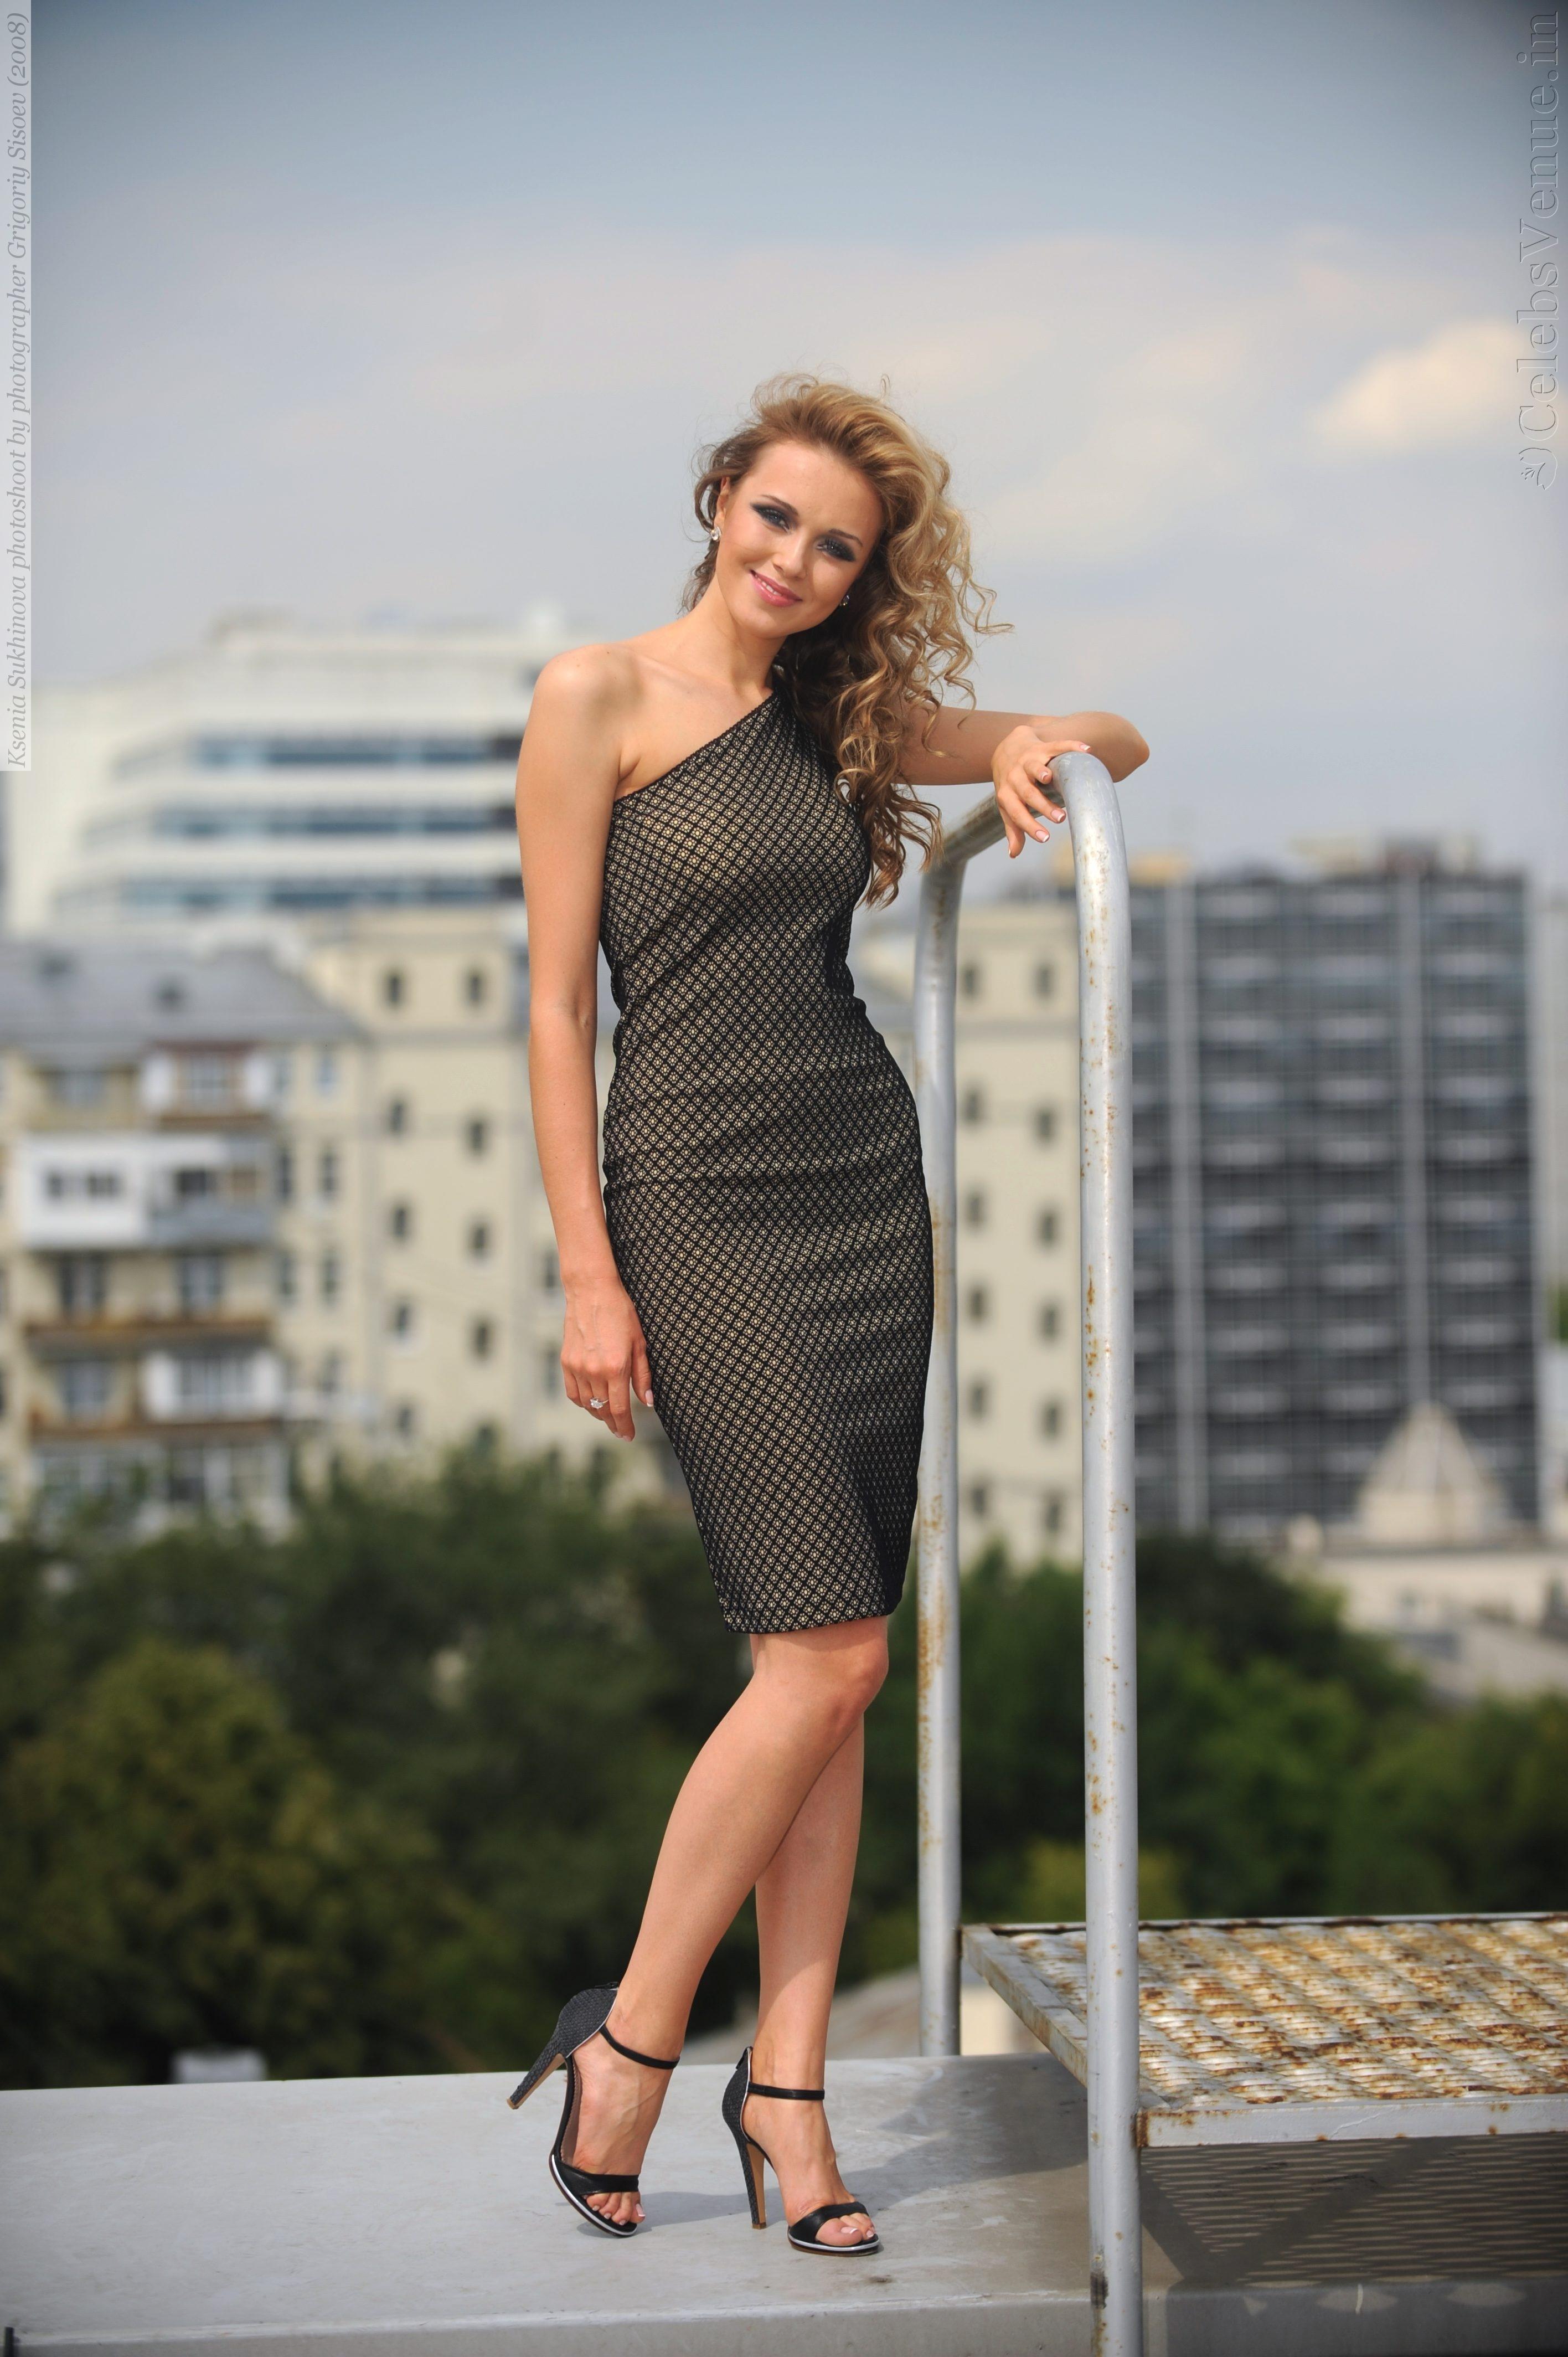 Ksenia Sukhinova Backgrounds on Wallpapers Vista